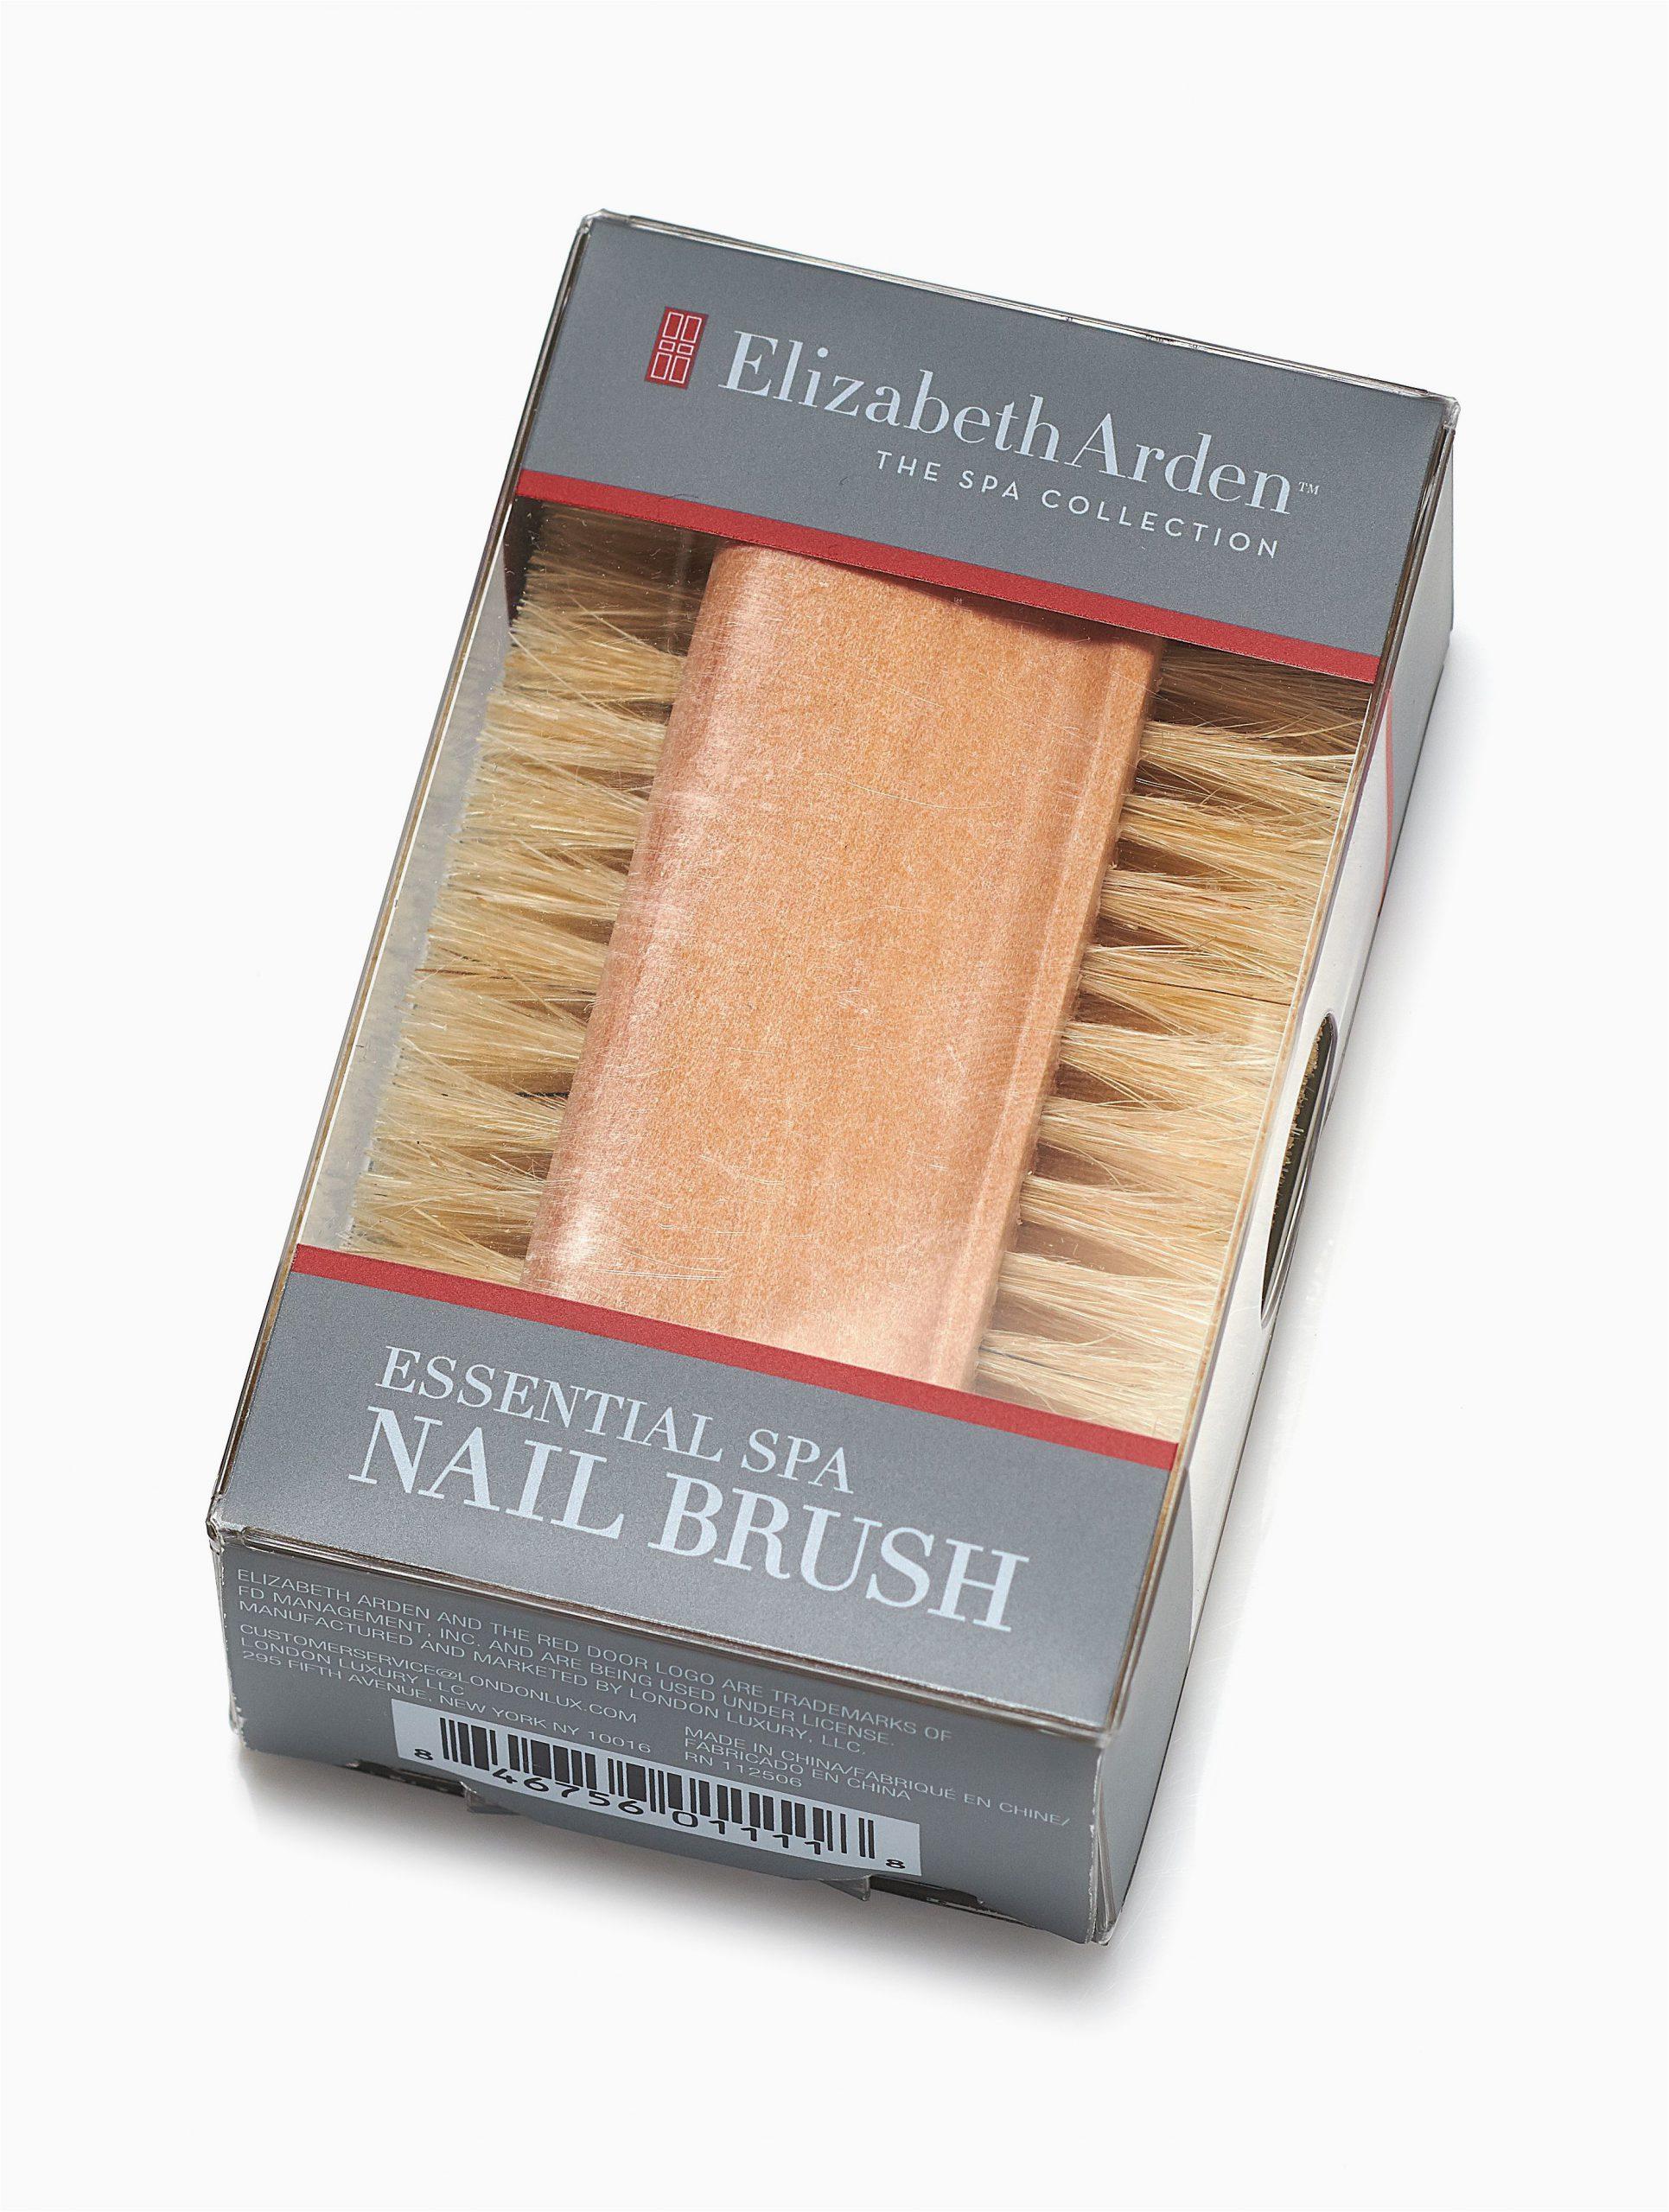 Elizabeth Arden Bath Rug Elizabeth Arden Elizabeth Arden Spa Collection Wood and Natural Boar Bristle Nail Brush Walmart